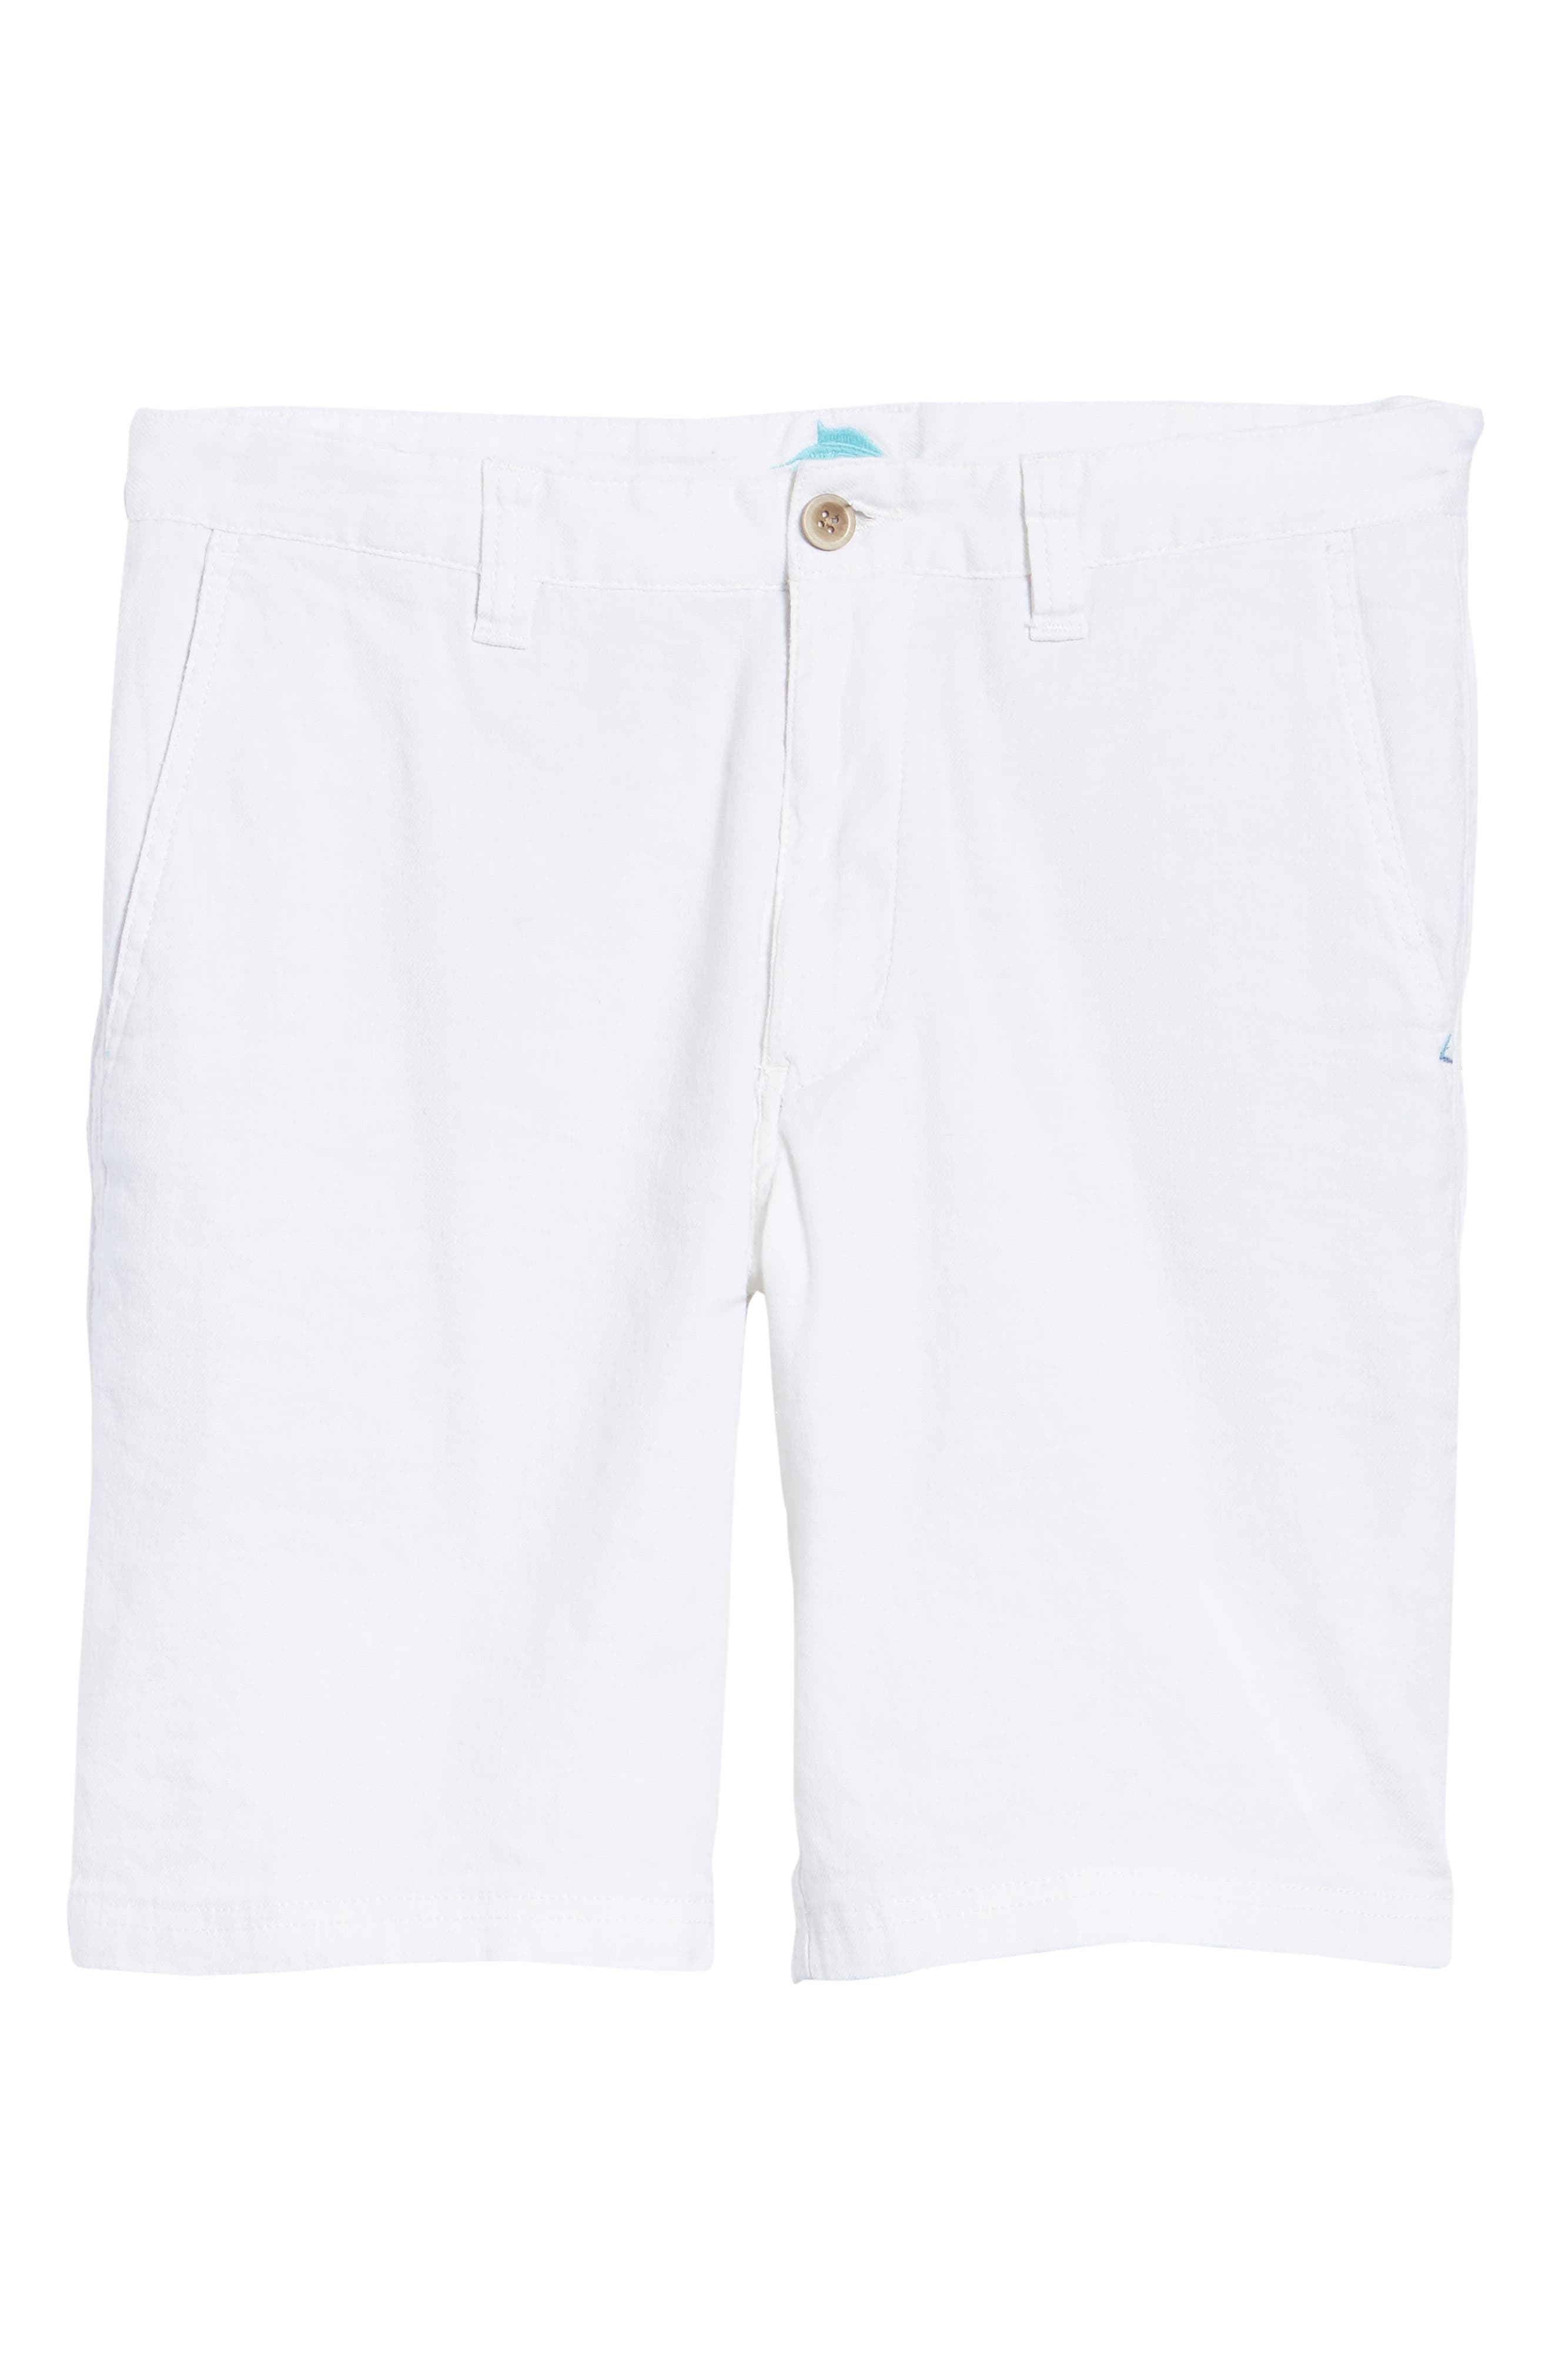 Beach Linen Blend Shorts,                             Alternate thumbnail 6, color,                             CONTINENTAL